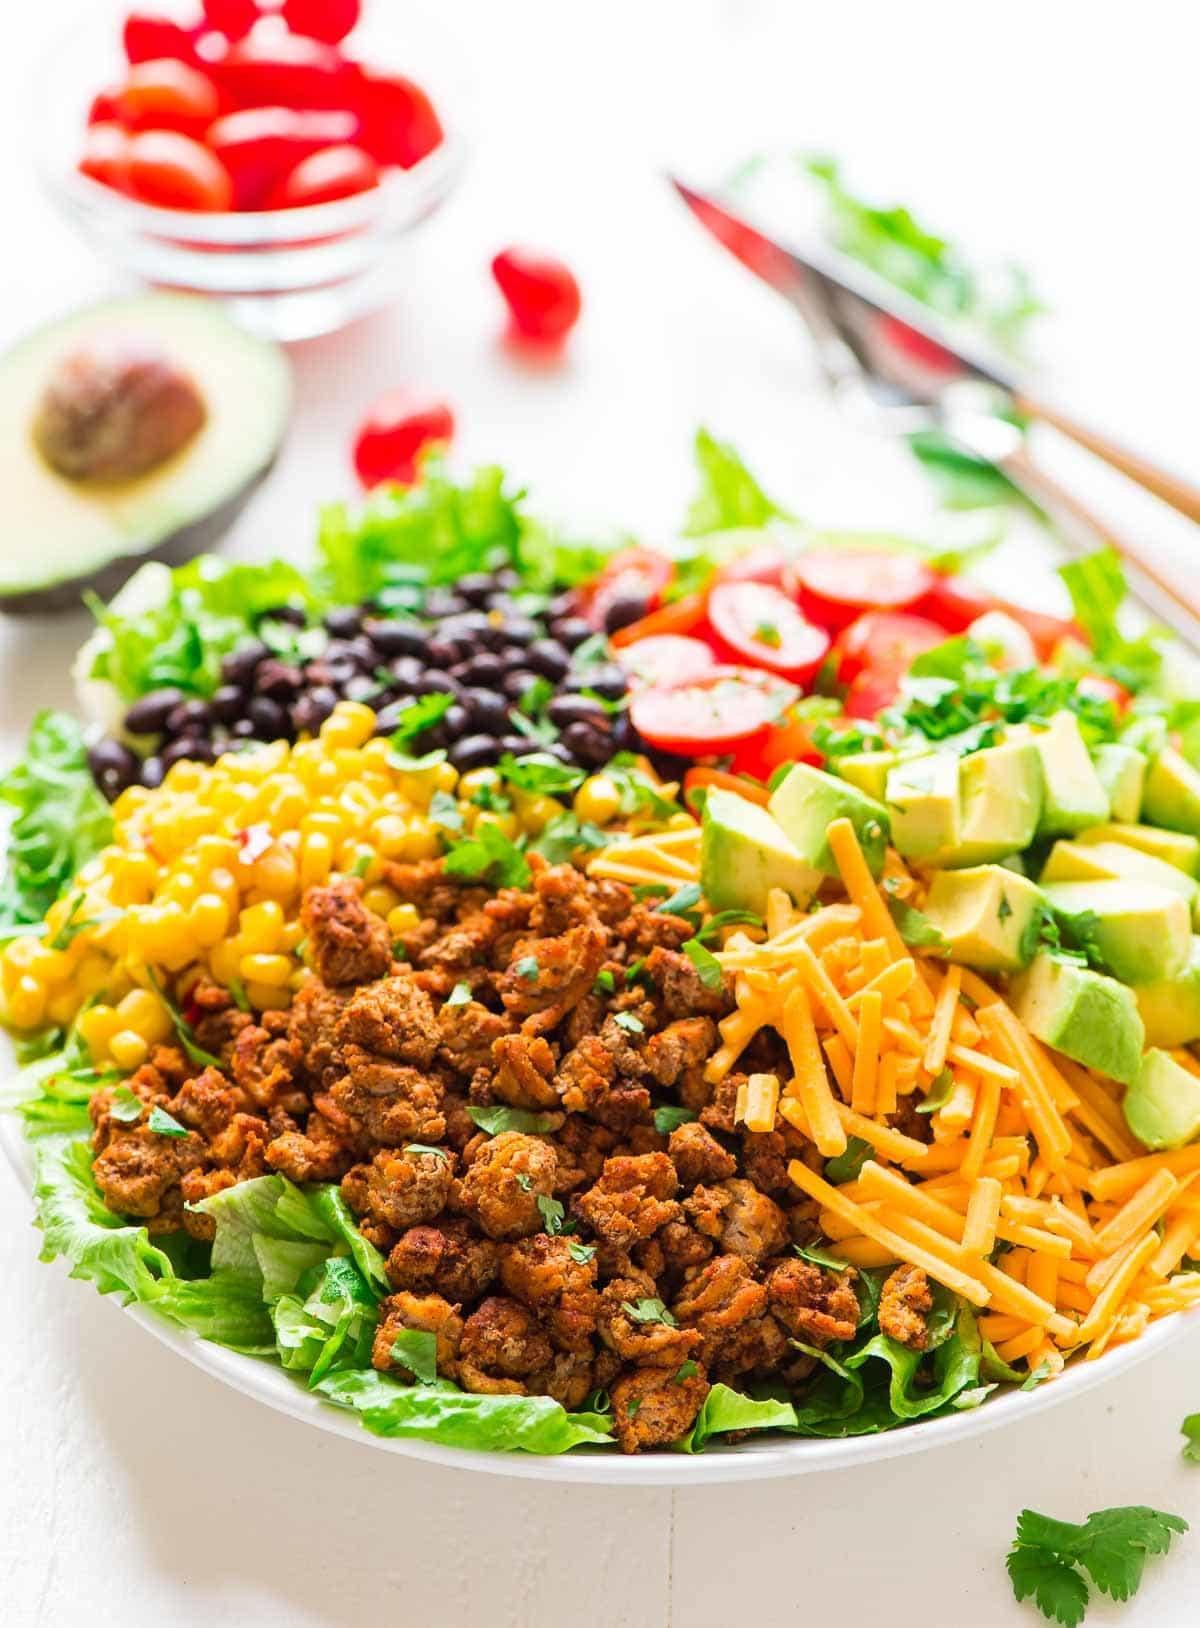 Healthy Beef Taco Salad  Skinny Taco Salad with Ground Turkey and Avocado